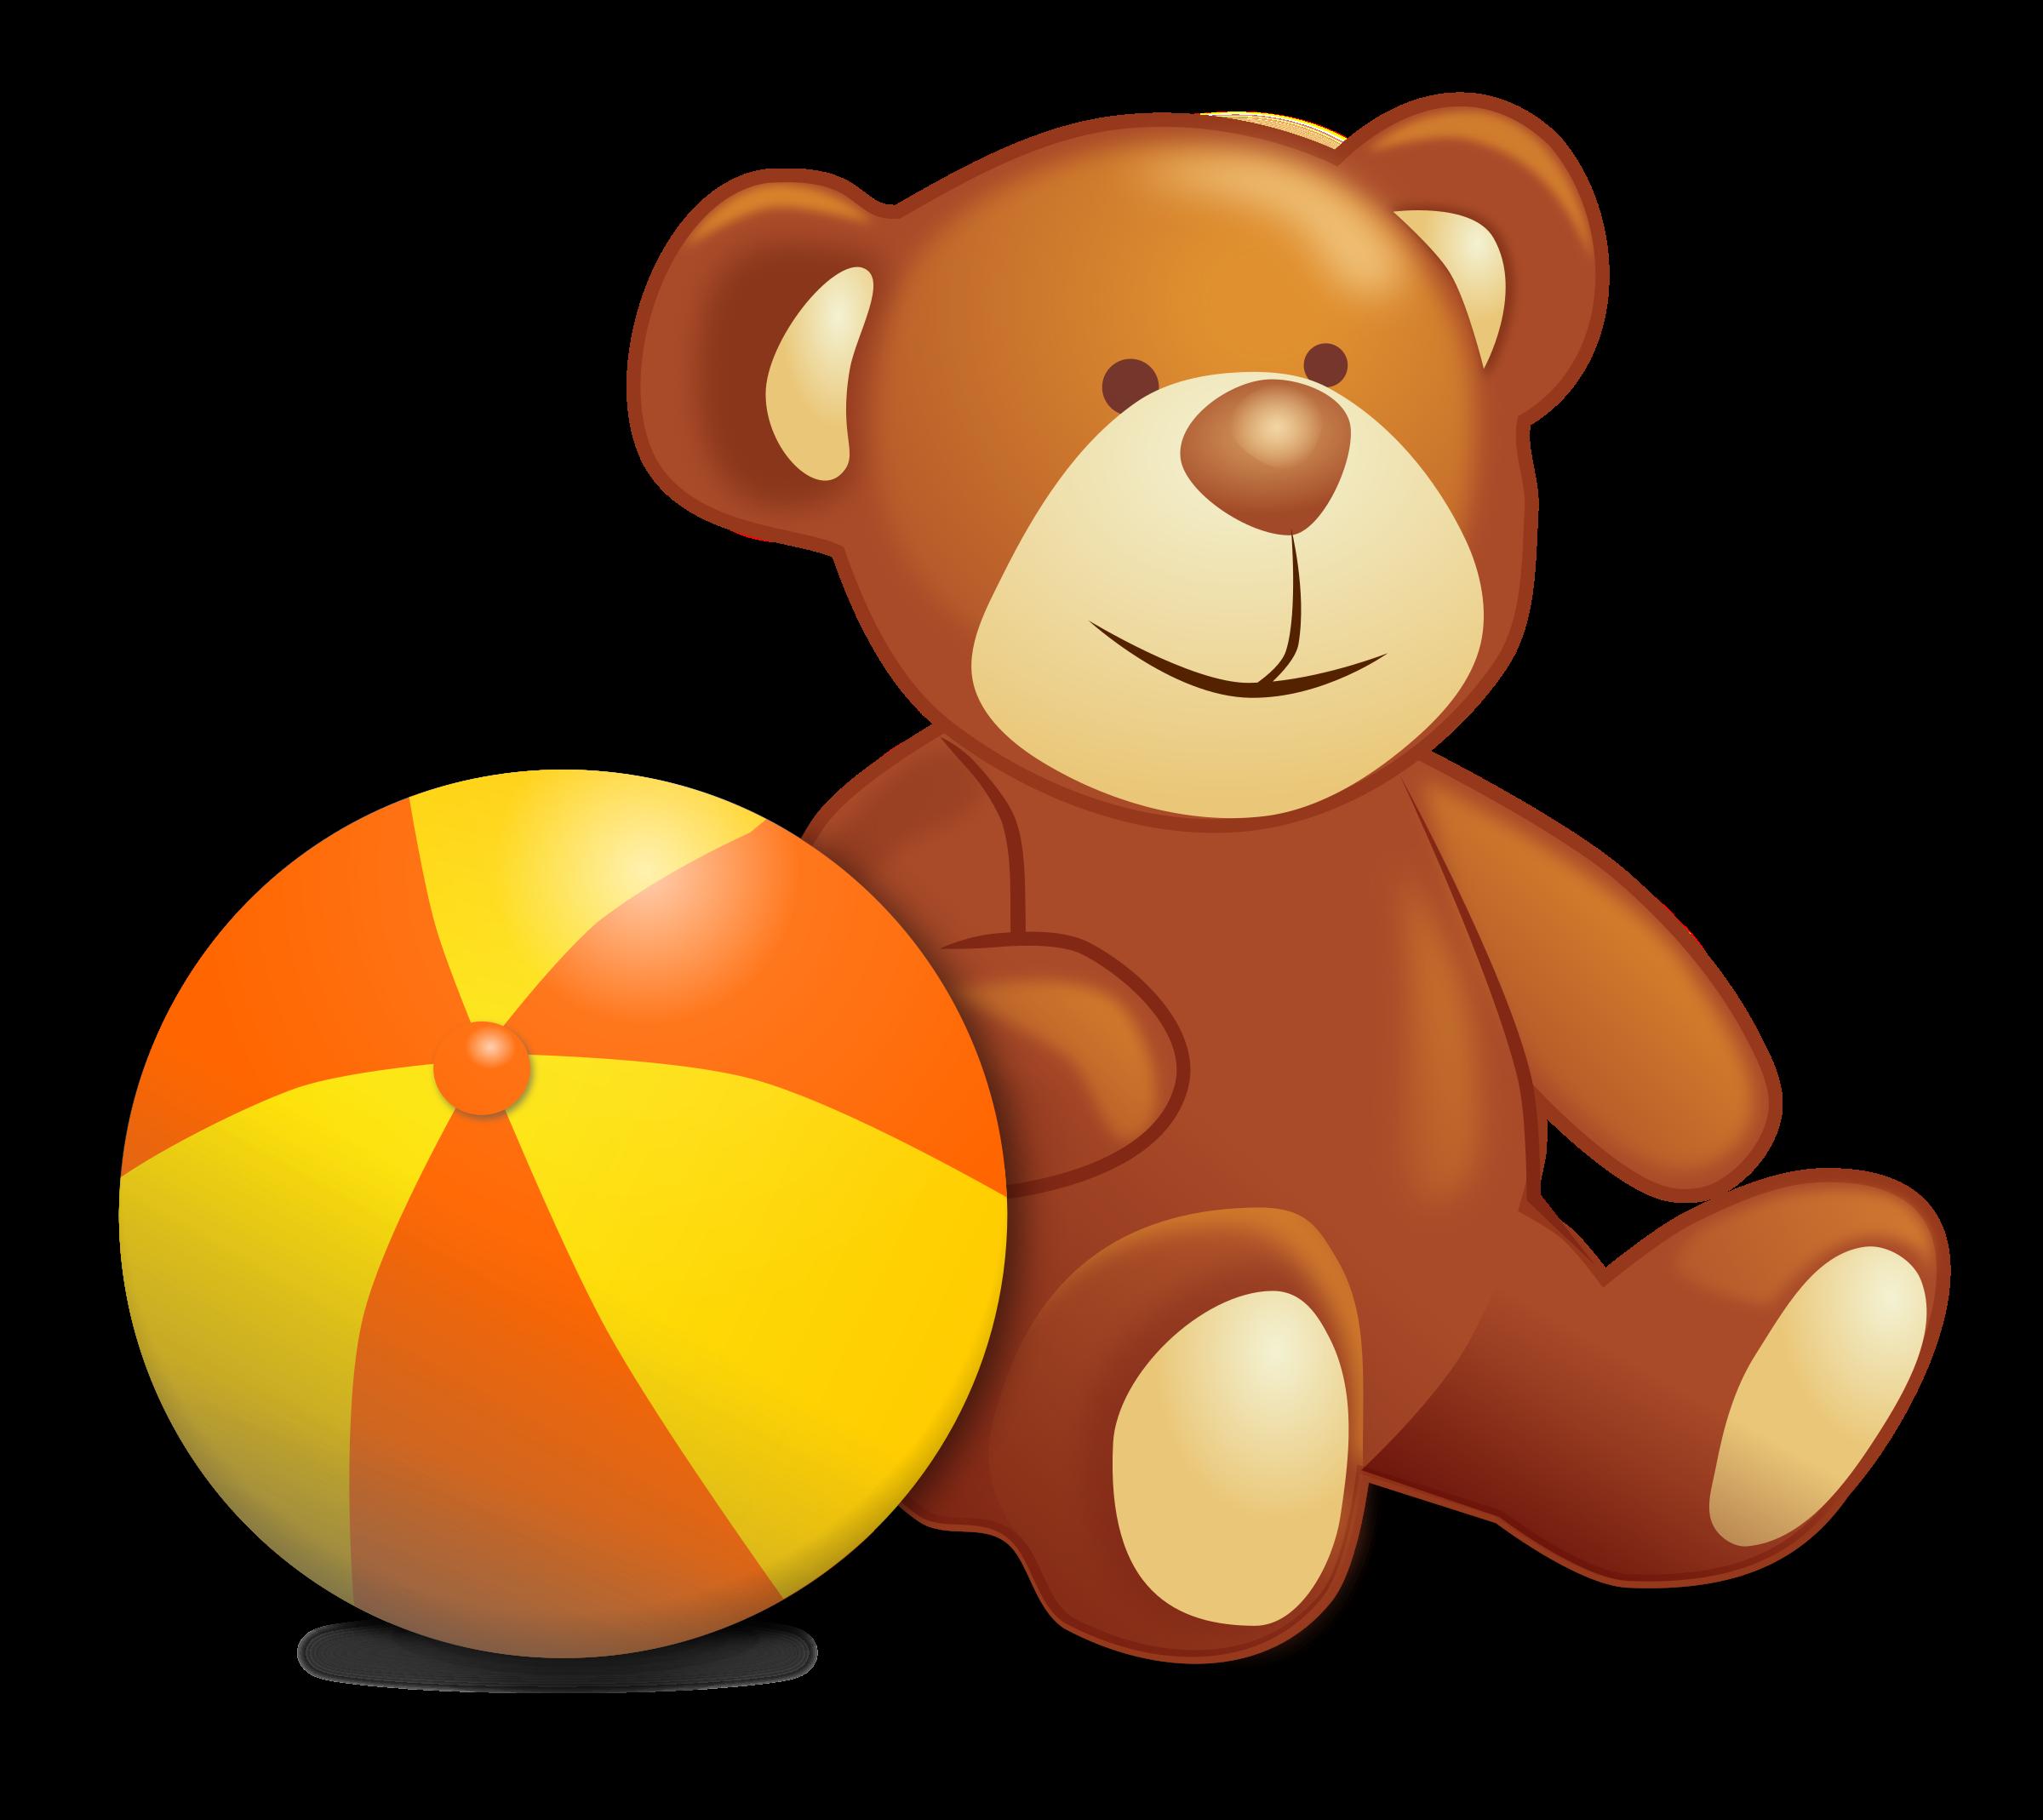 Big image png. Clipart bear orange